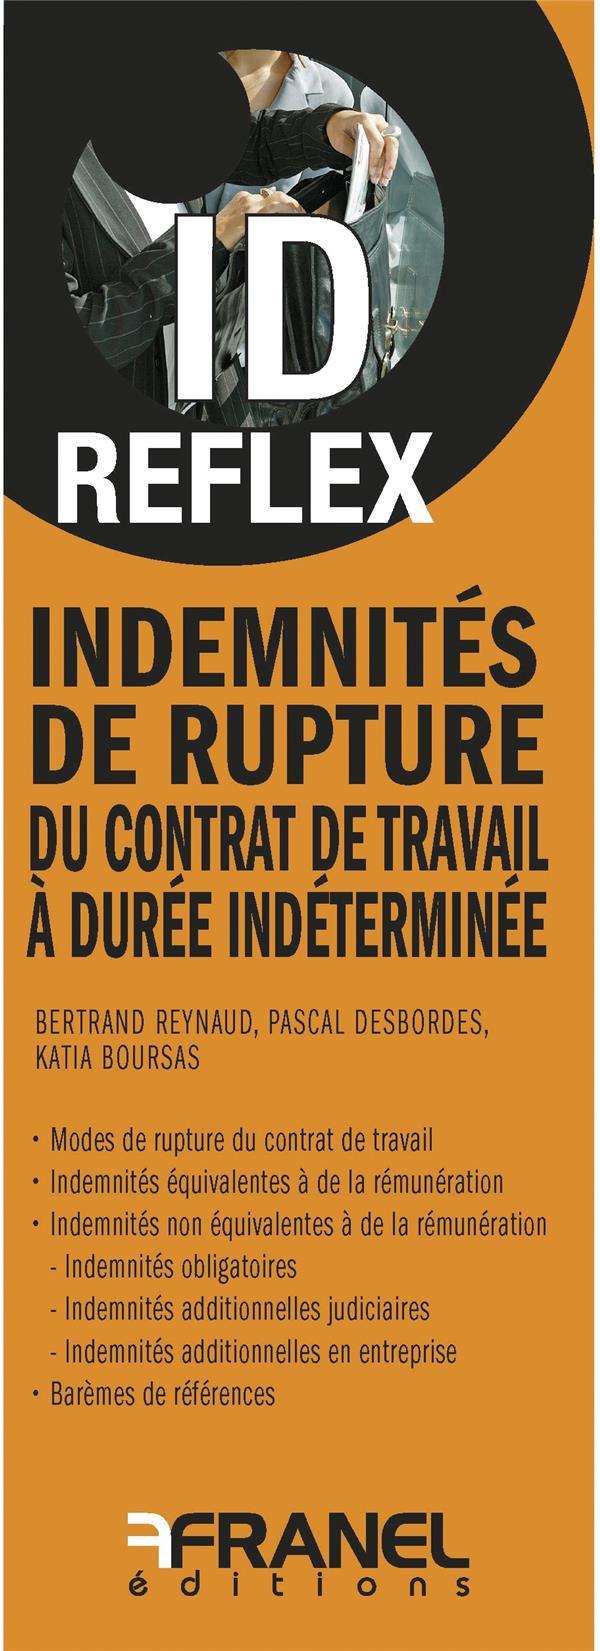 ID REFLEX INDEMNITES DE RUPTURE DU CONTRAT DE TRAVAIL A DUREE INDETERMINEE